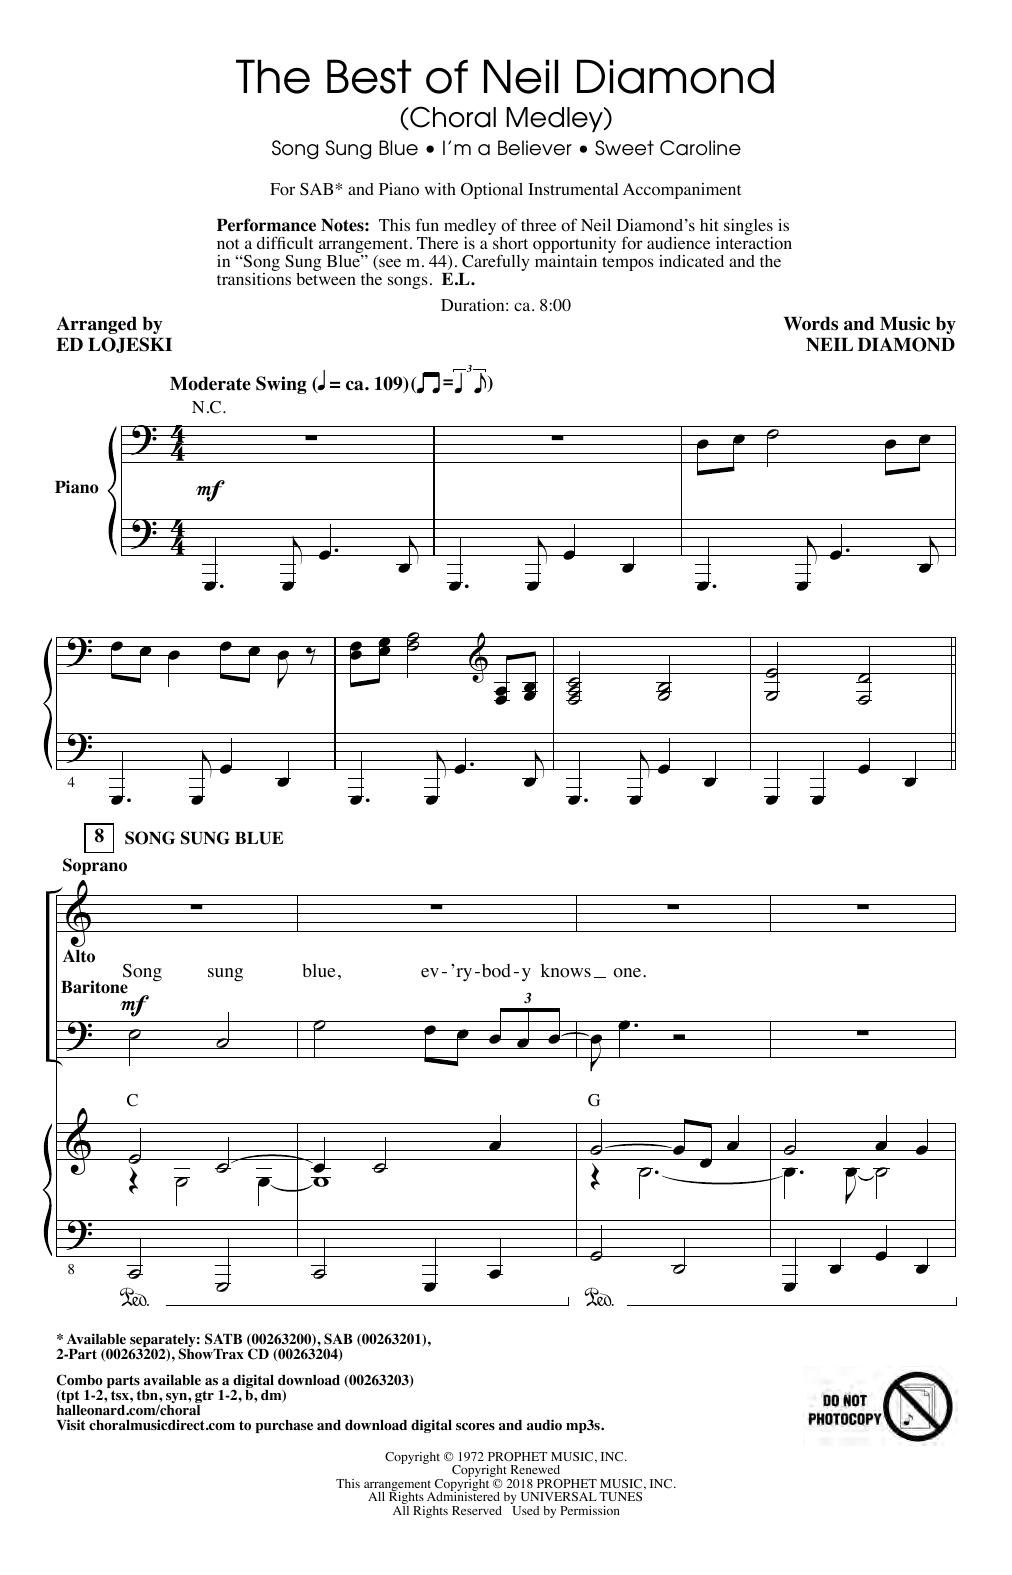 The Best of Neil Diamond (arr. Ed Lojeski) Sheet Music